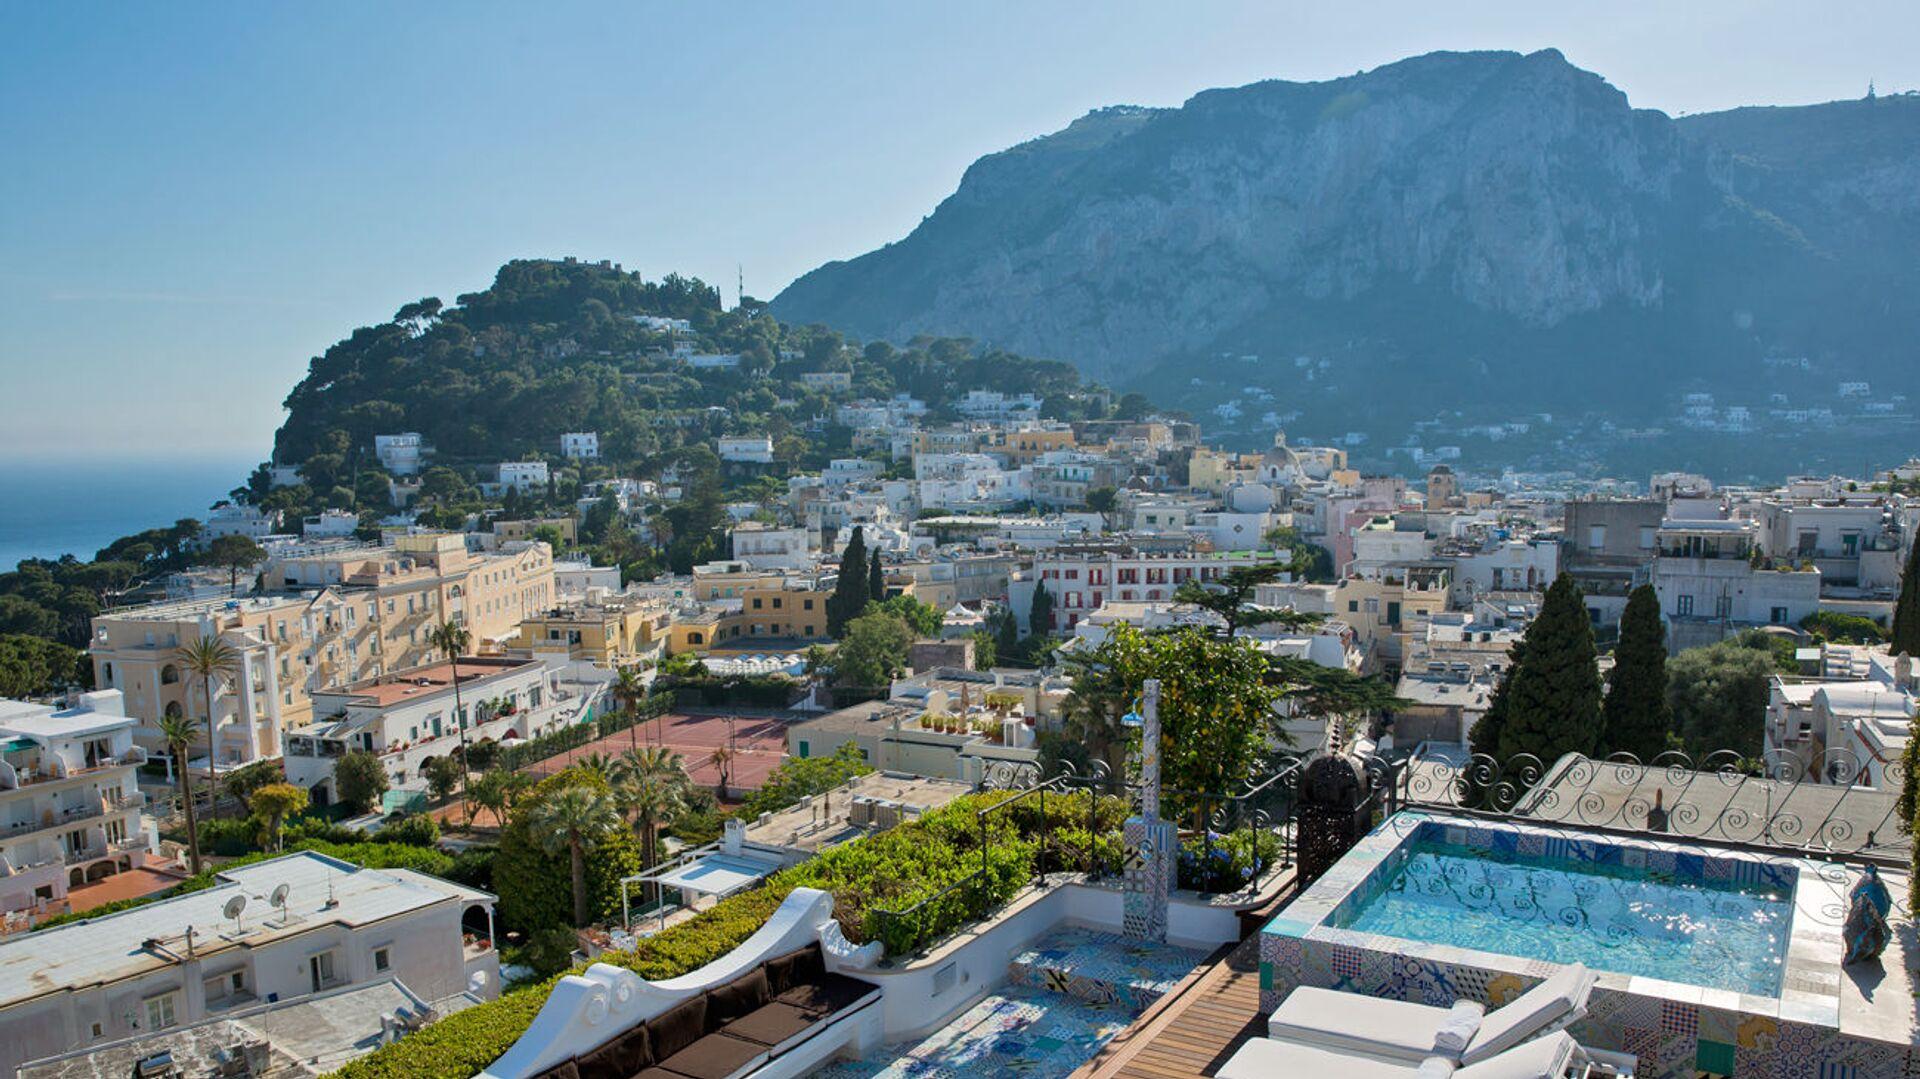 La vista dall'albergo Capri Tiberio Palace a Capri, Italia. - Sputnik Italia, 1920, 22.07.2021